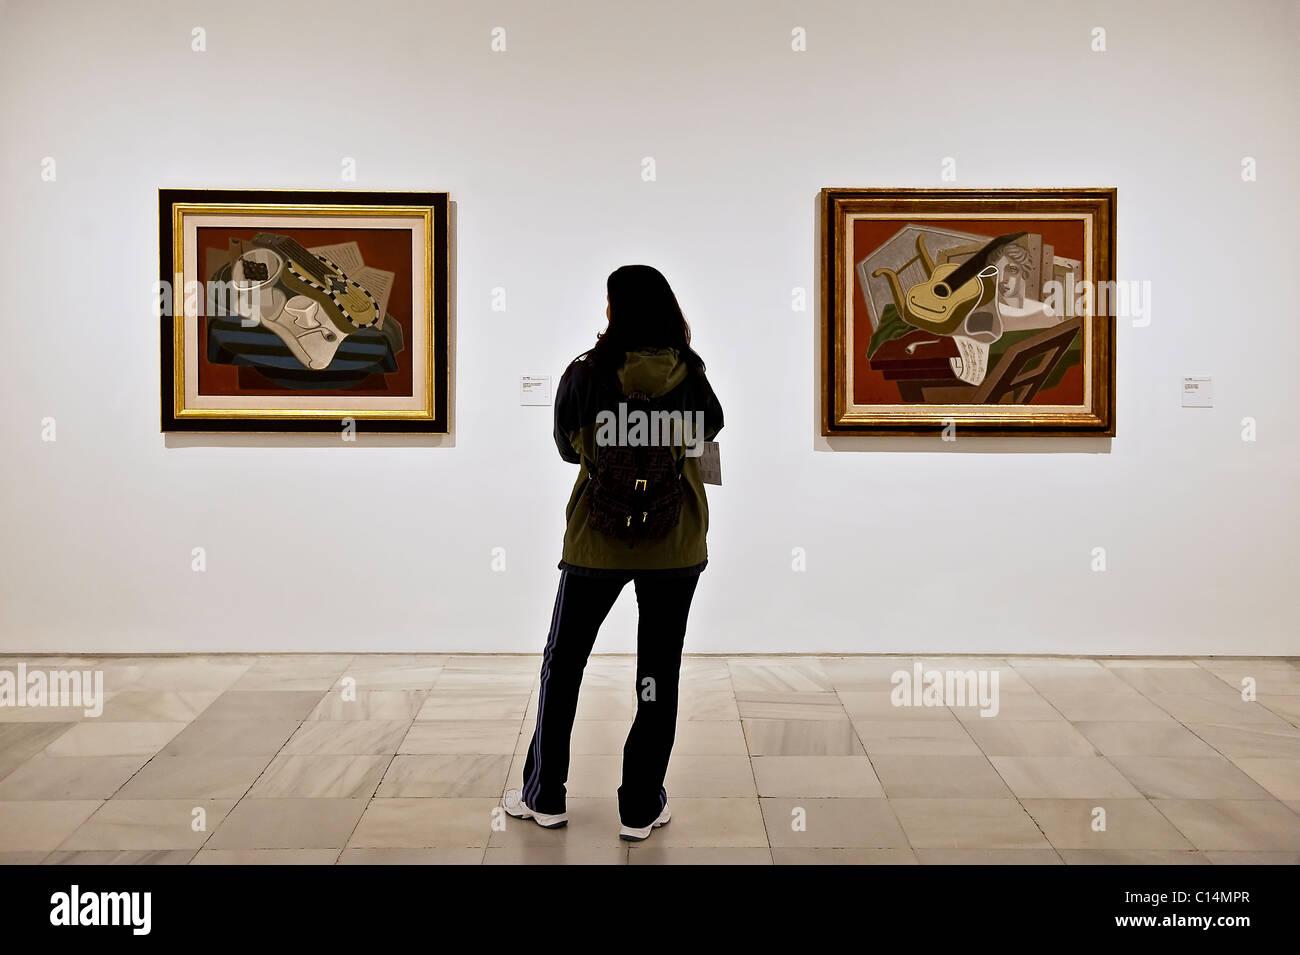 Juan Gris paintings in the Reina Sofia museum, Madrid, Spain - Stock Image